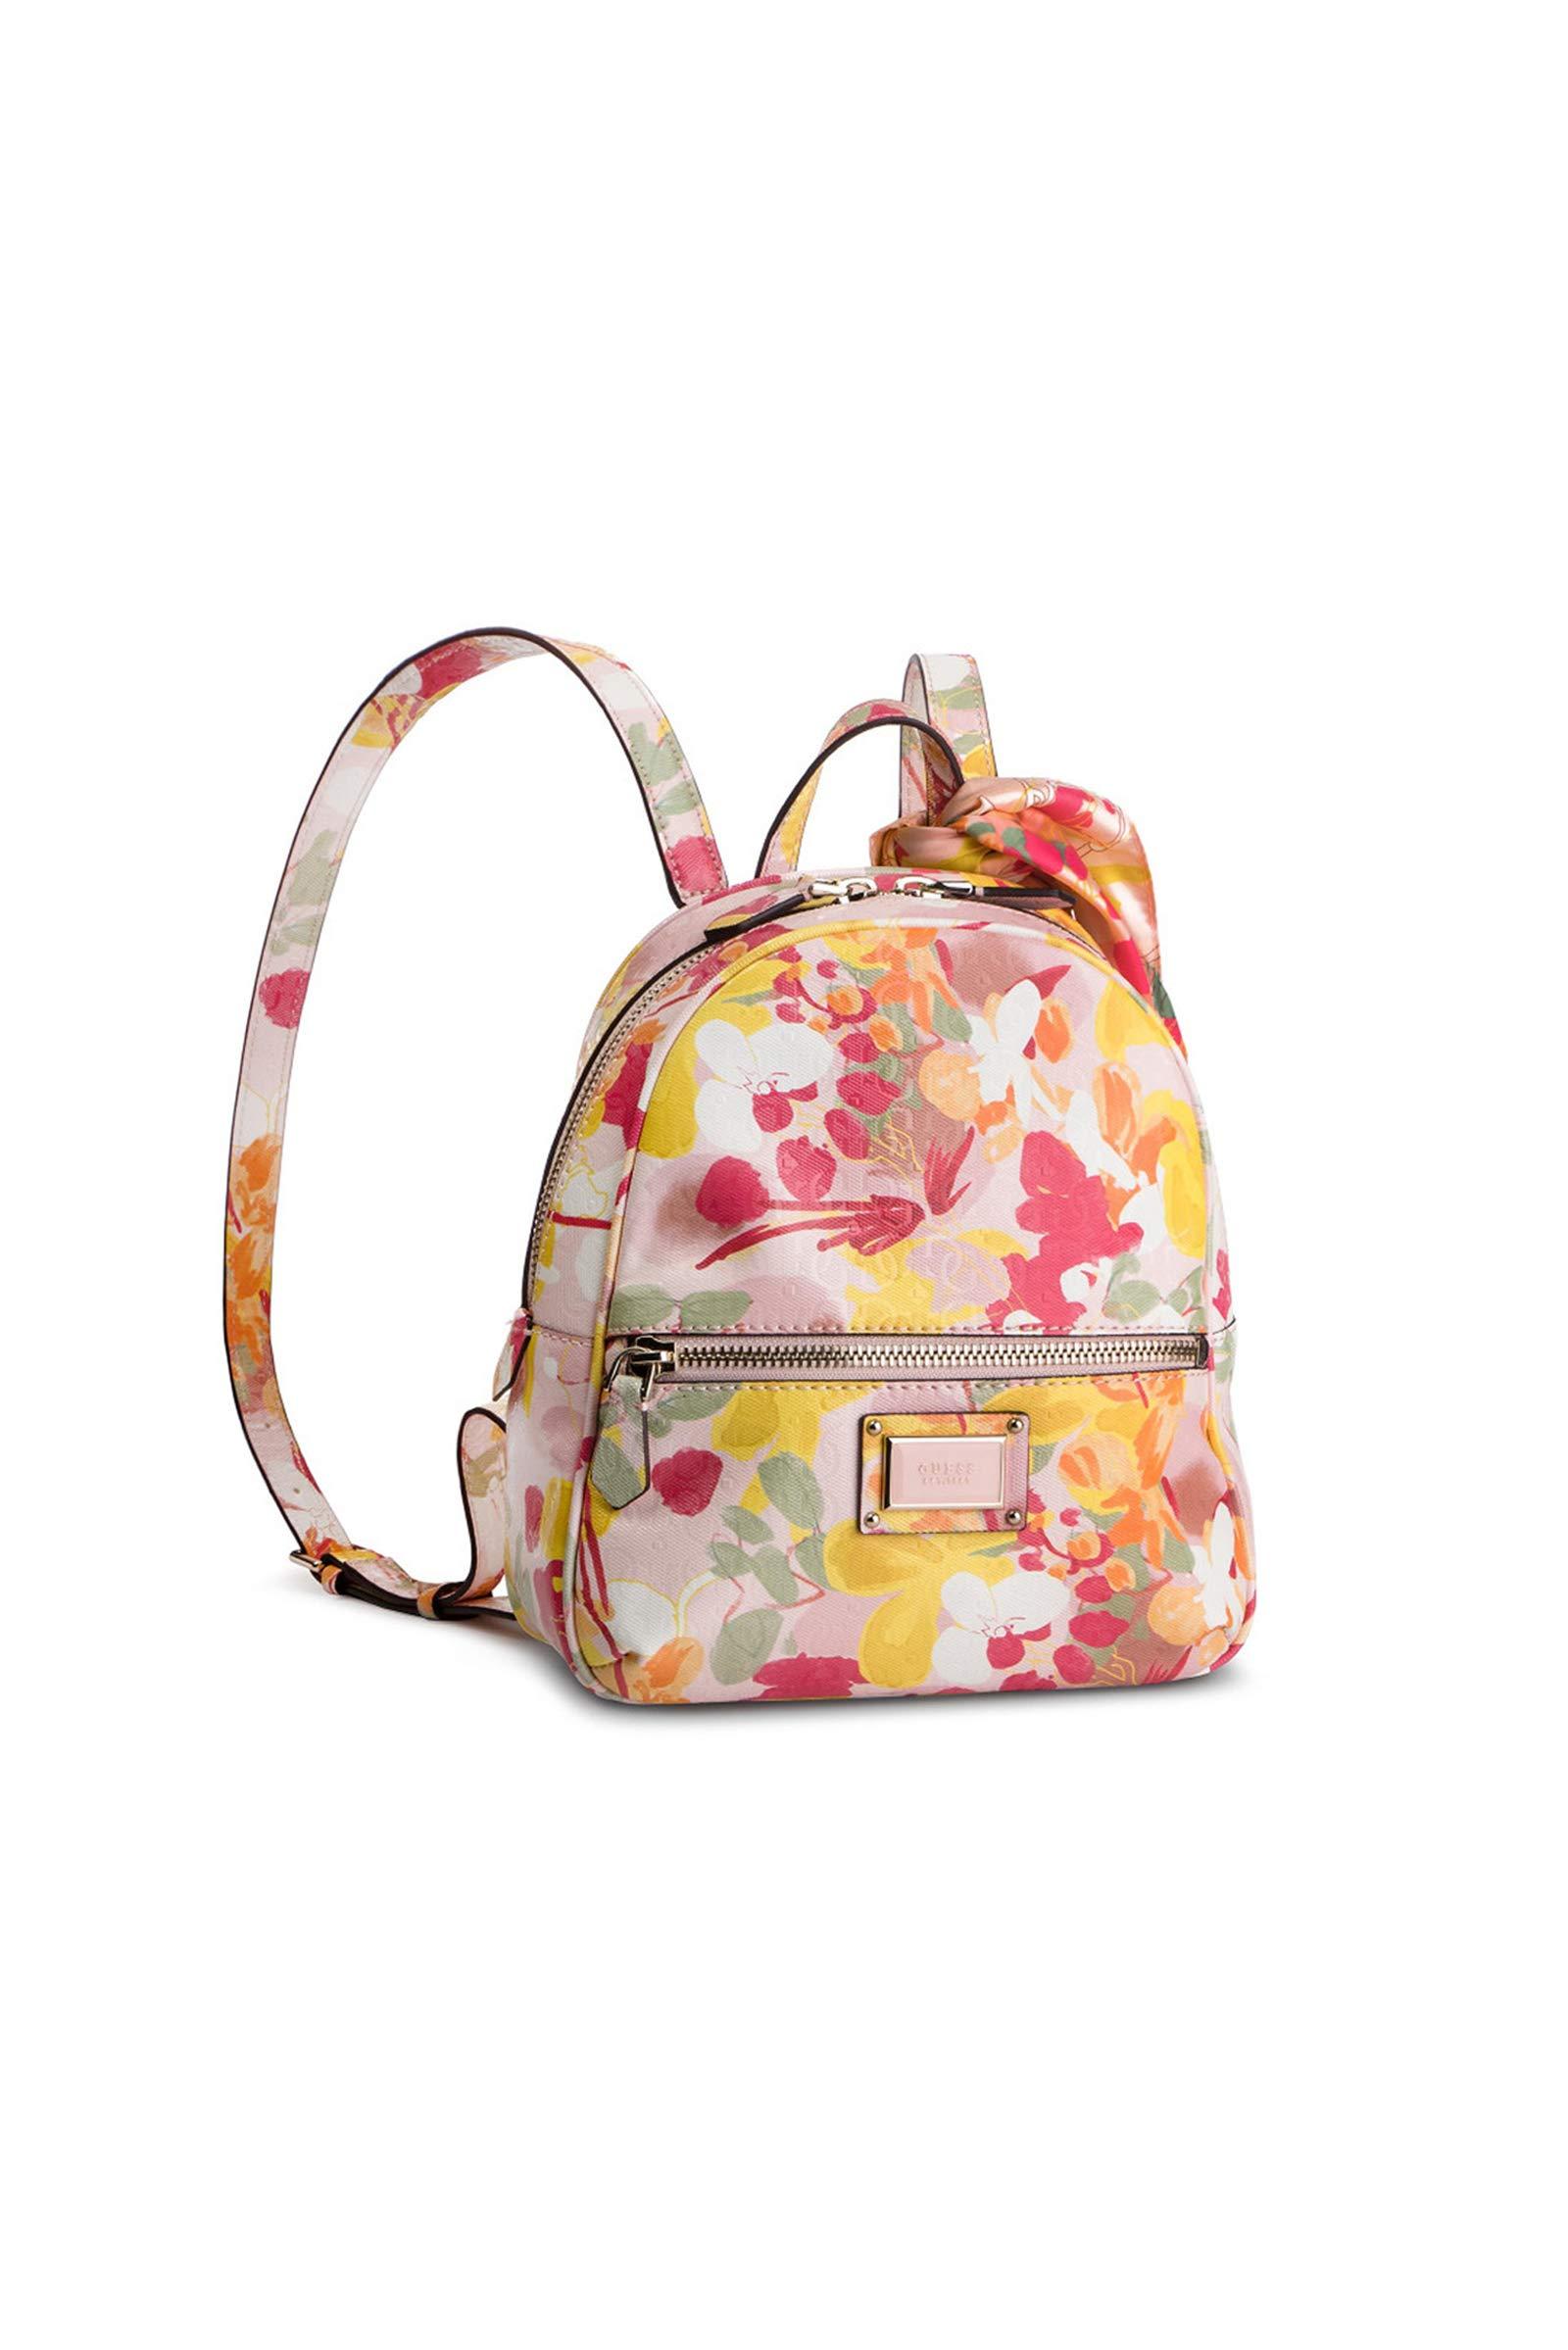 71z9nDAeB6L - Guess Shannon Backpack - Mochilas Mujer